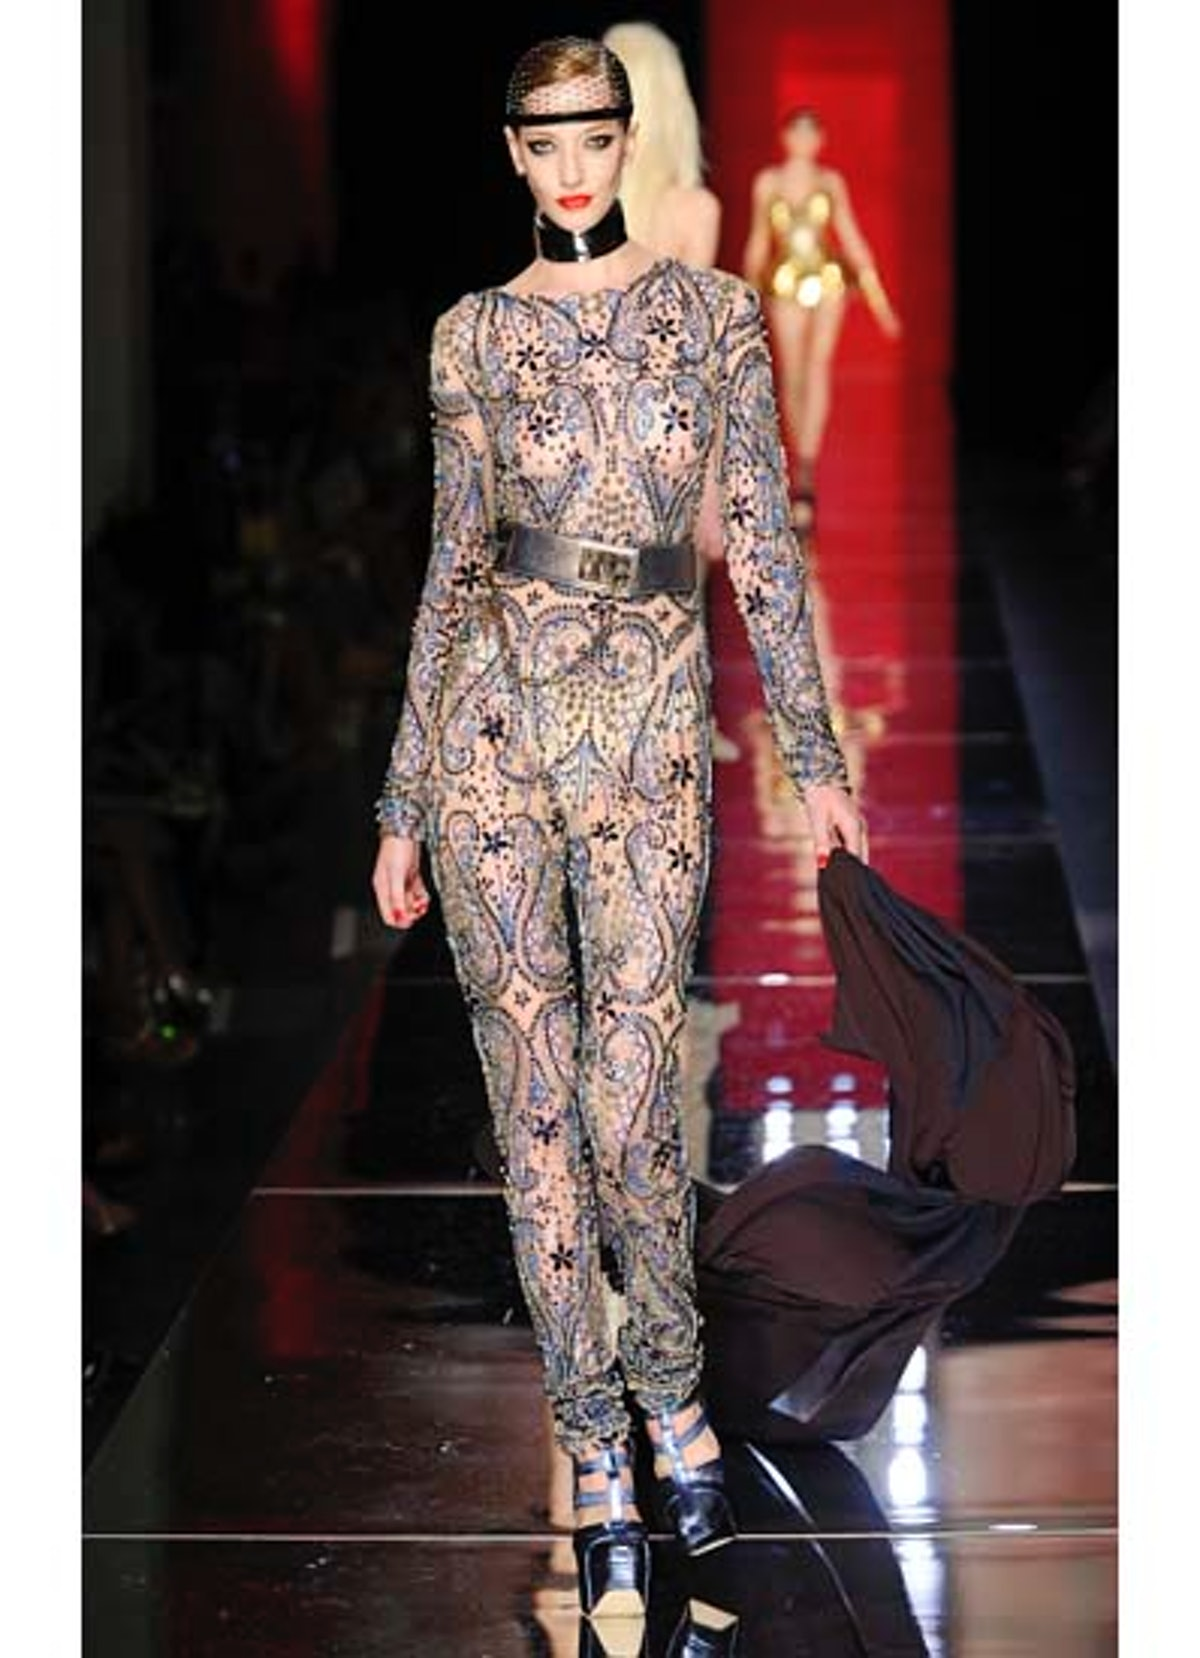 fass-jean-paul-gaultier-couture-2012-runway-56-v.jpg